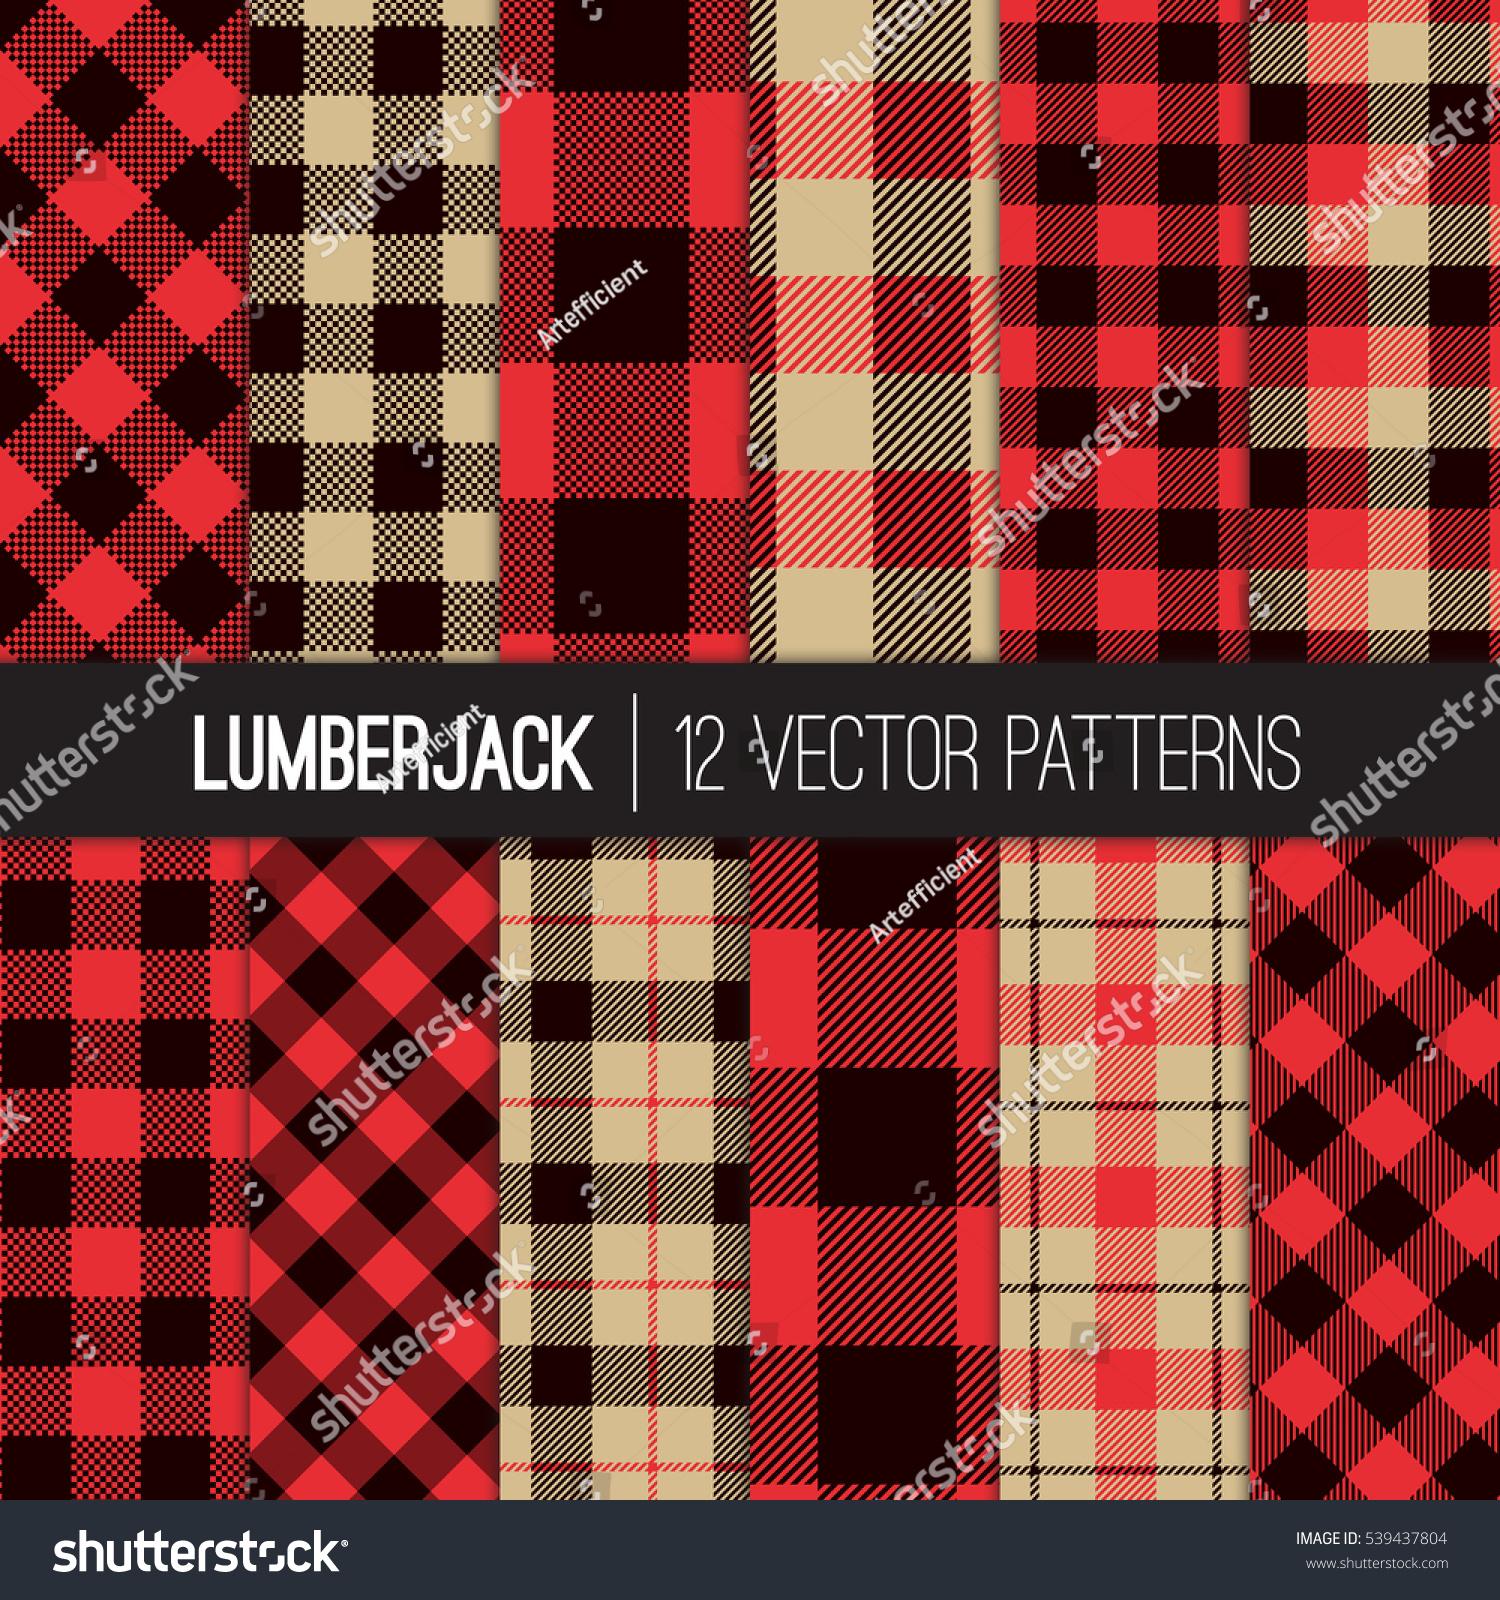 Lumberjack Patterns Red Black Camel Beige Stock Vector